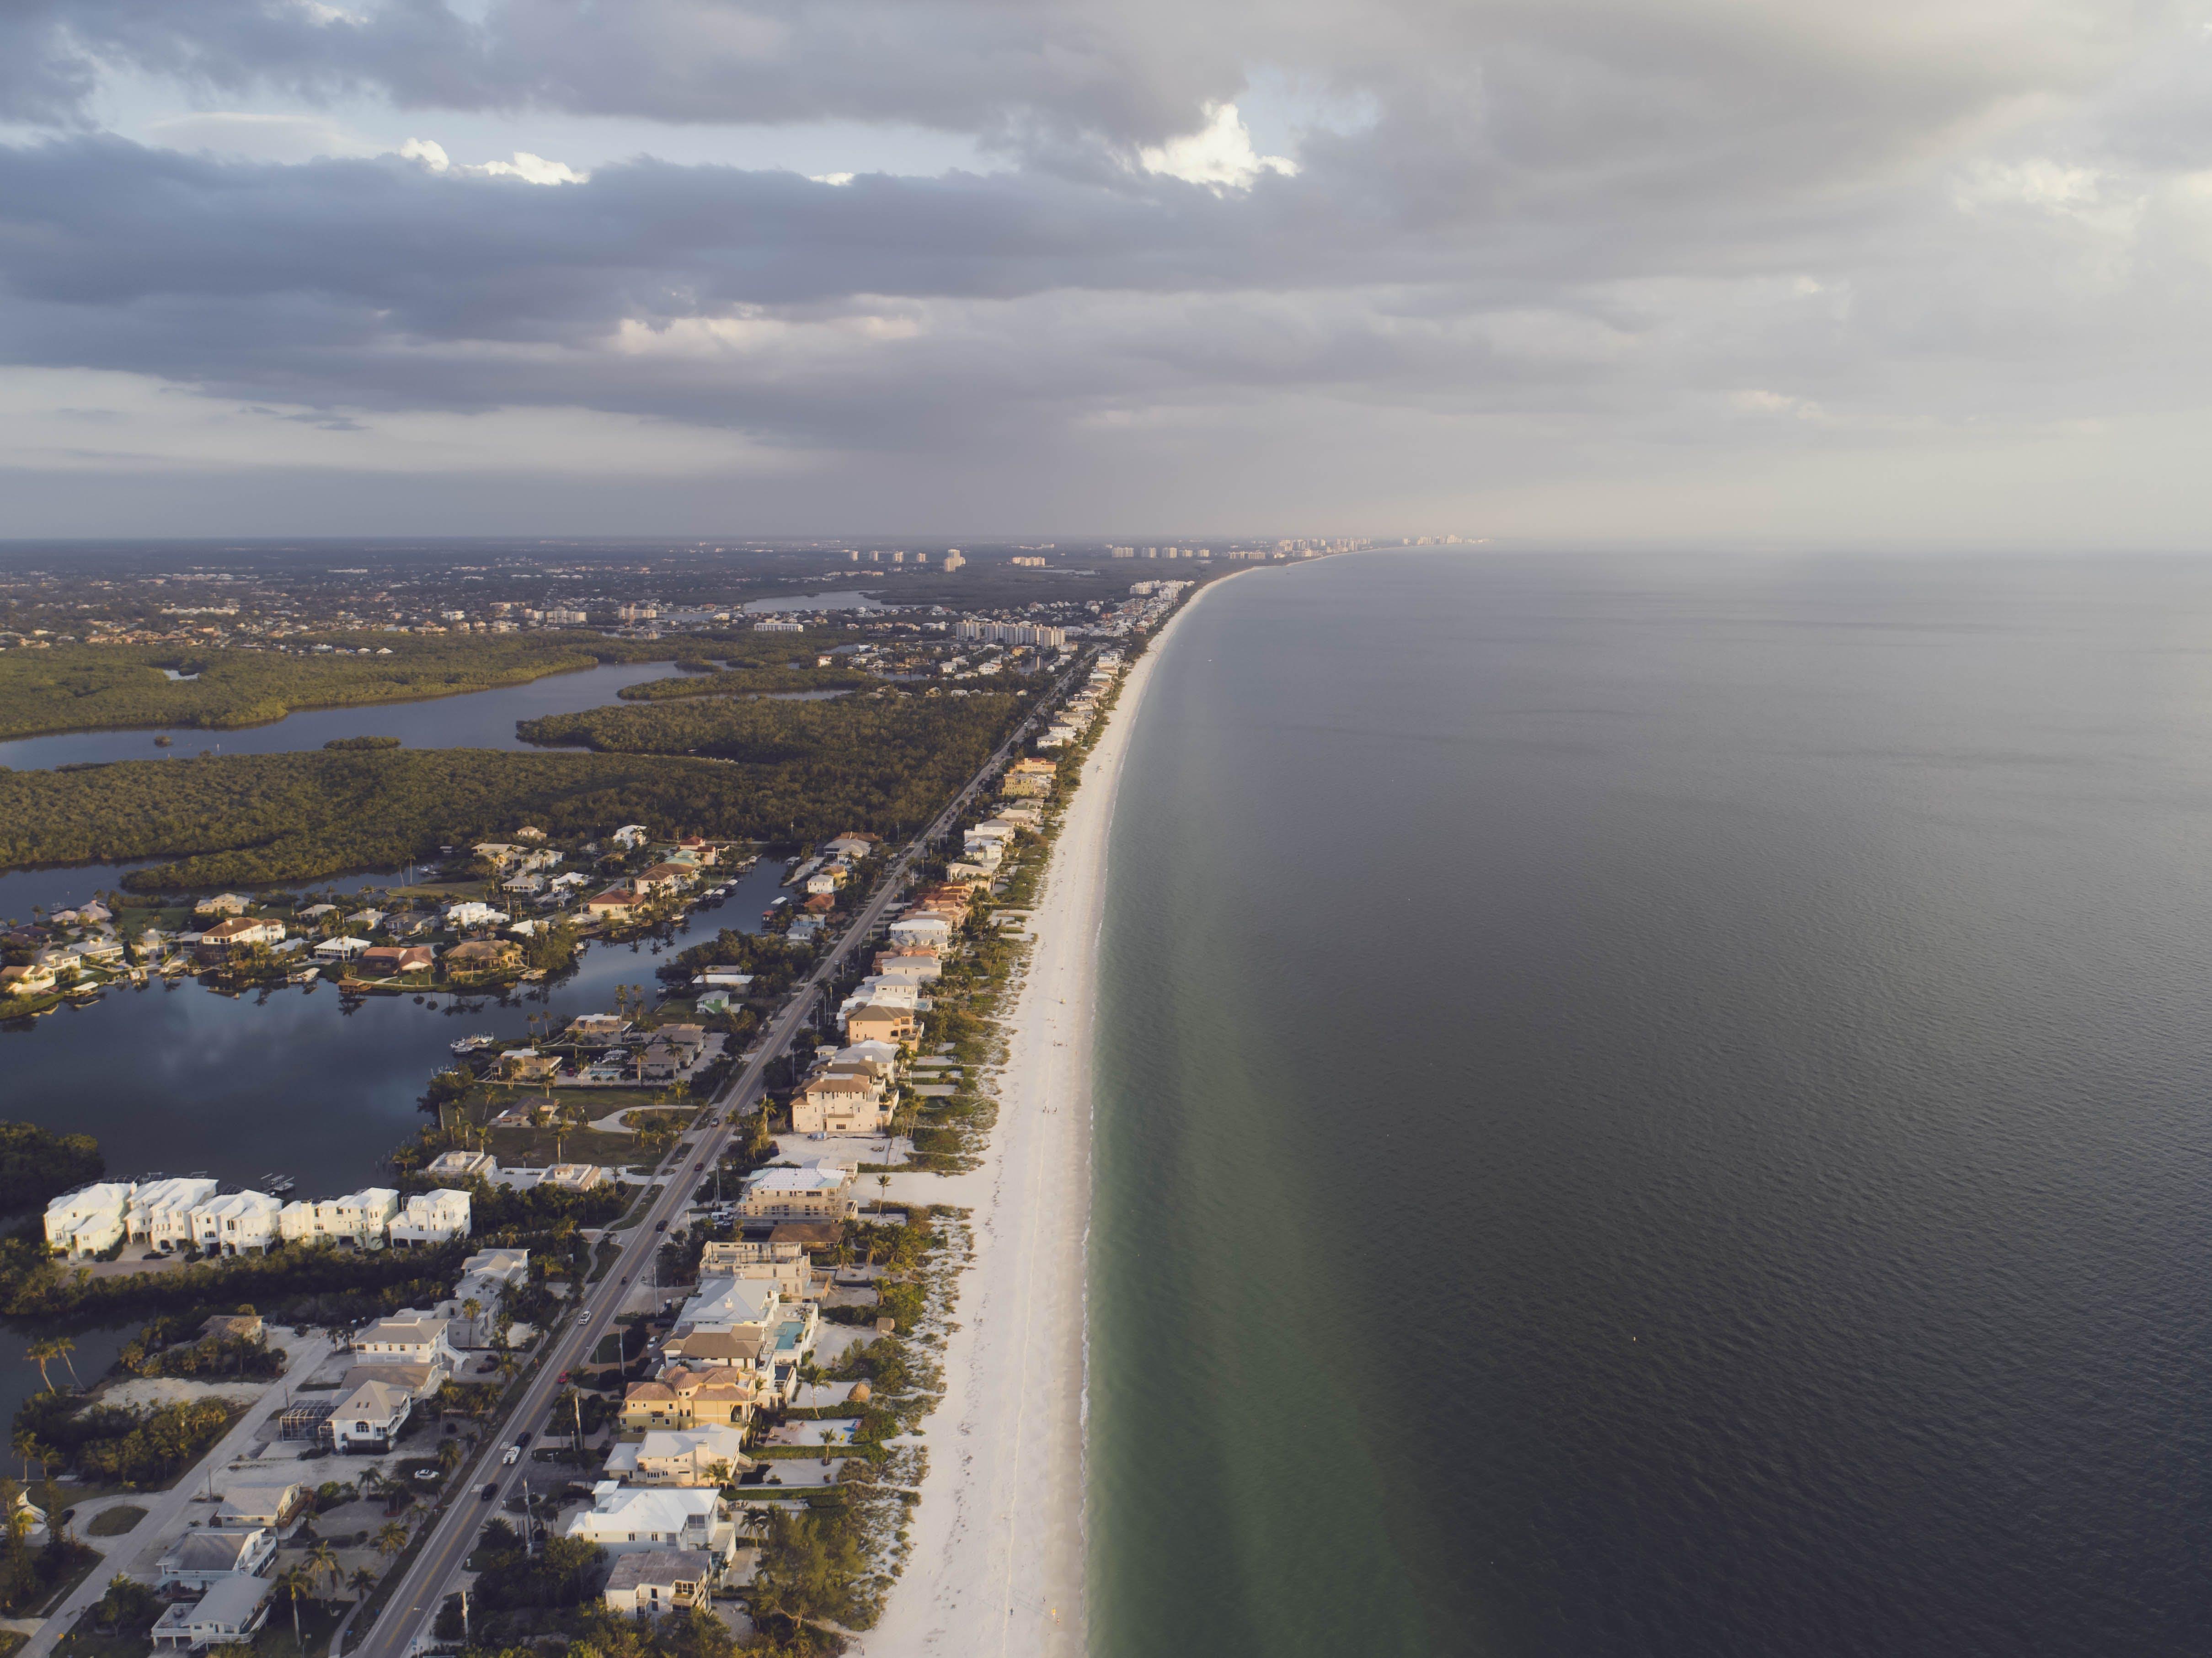 Photos gratuites de baie, bâtiments, bord de l'océan, bord de mer